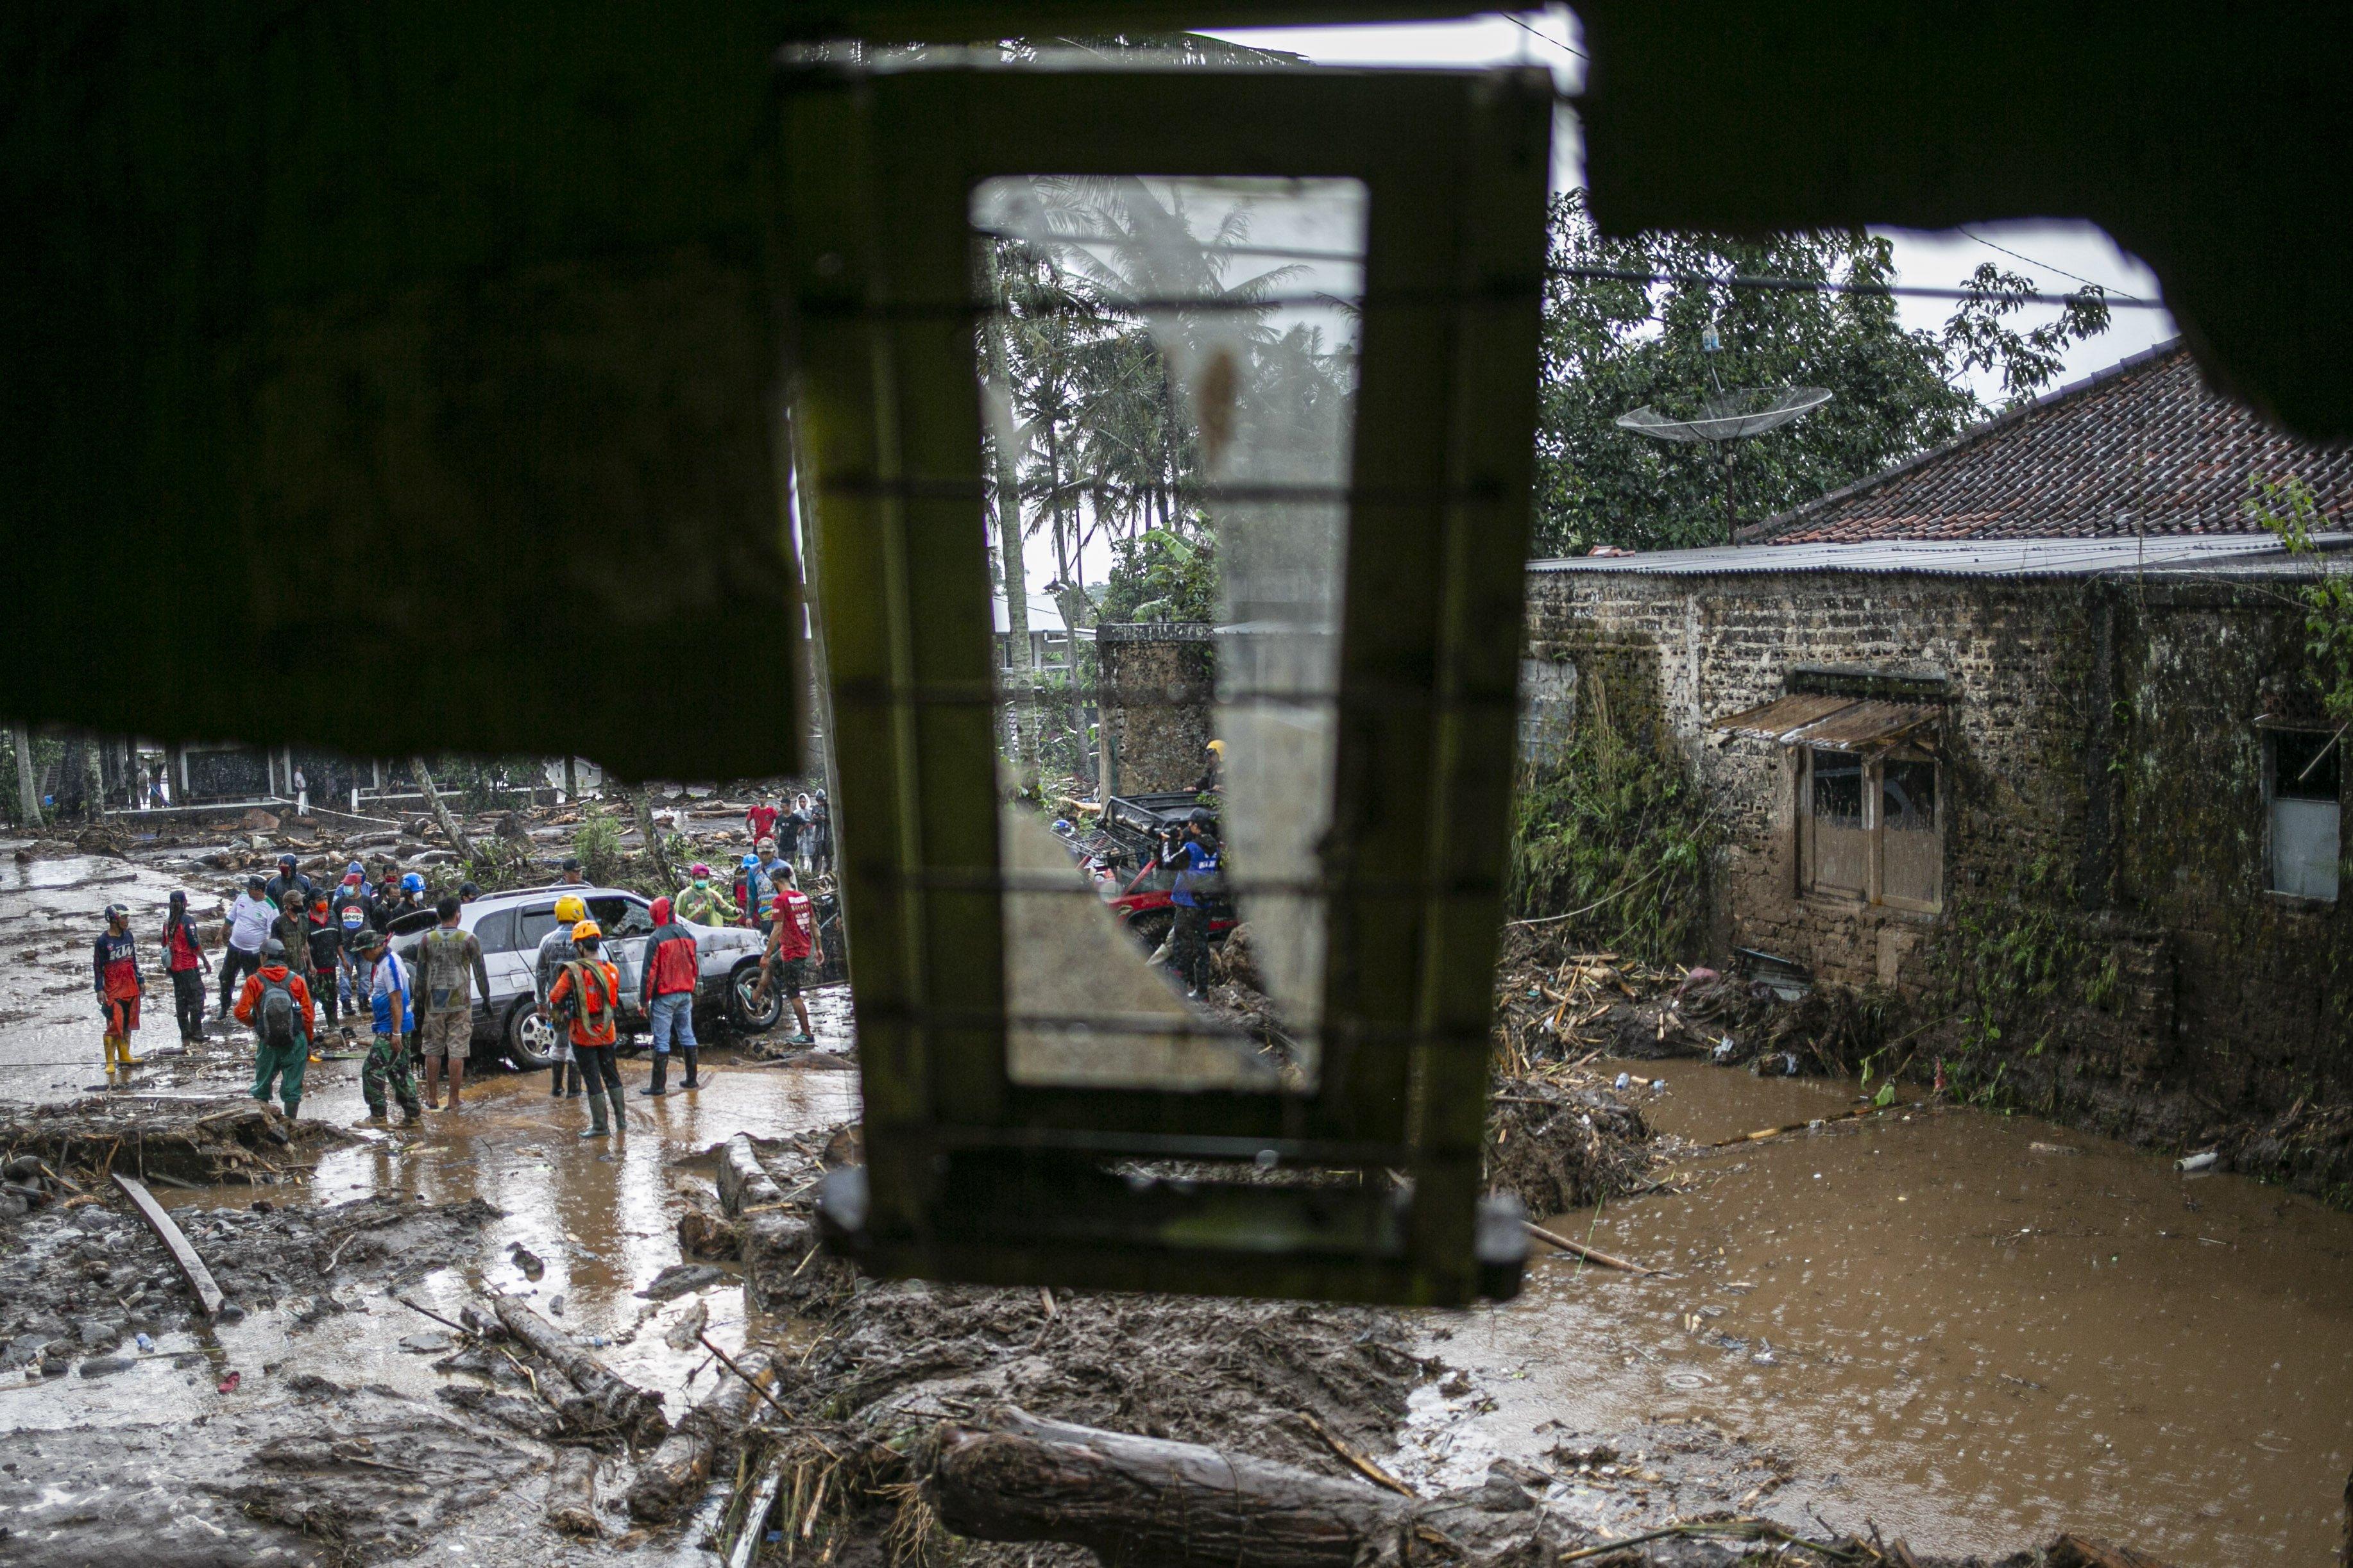 Sejumlah relawan berusaha mengevakuasi mobil yang tester banjir bandang di Kampung Cibuntu, Desa Pasawahan, Kecamatan Cicurug, Sukabumi, Jawa Barat, Selasa (22/9/2020). Data sementara yang dikeluarkan Badan Penanggulangan Bencana Daerah Kabupaten Sukabumi, Jawa Barat, dampak akibat banjir bandang yang terjadi di Kecamatan Cicurug, Senin (21/9), mengakibatkan 12 rumah hanyut dan 85 rumah terendam.